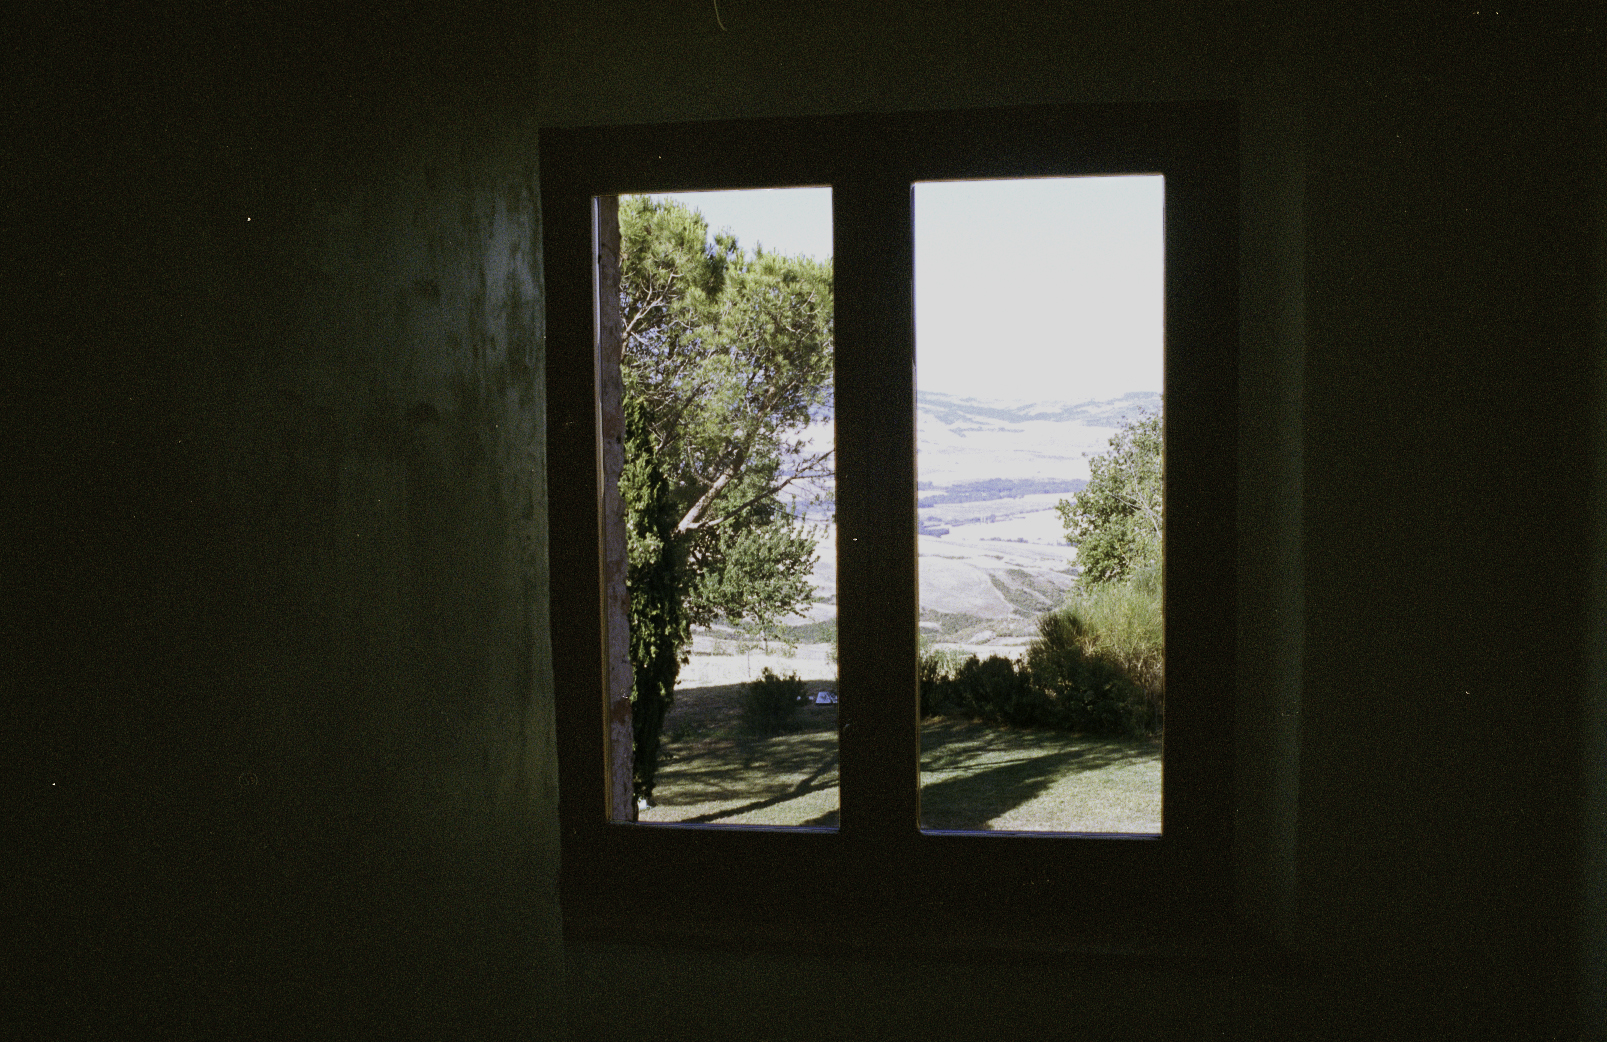 tuscany01.jpg